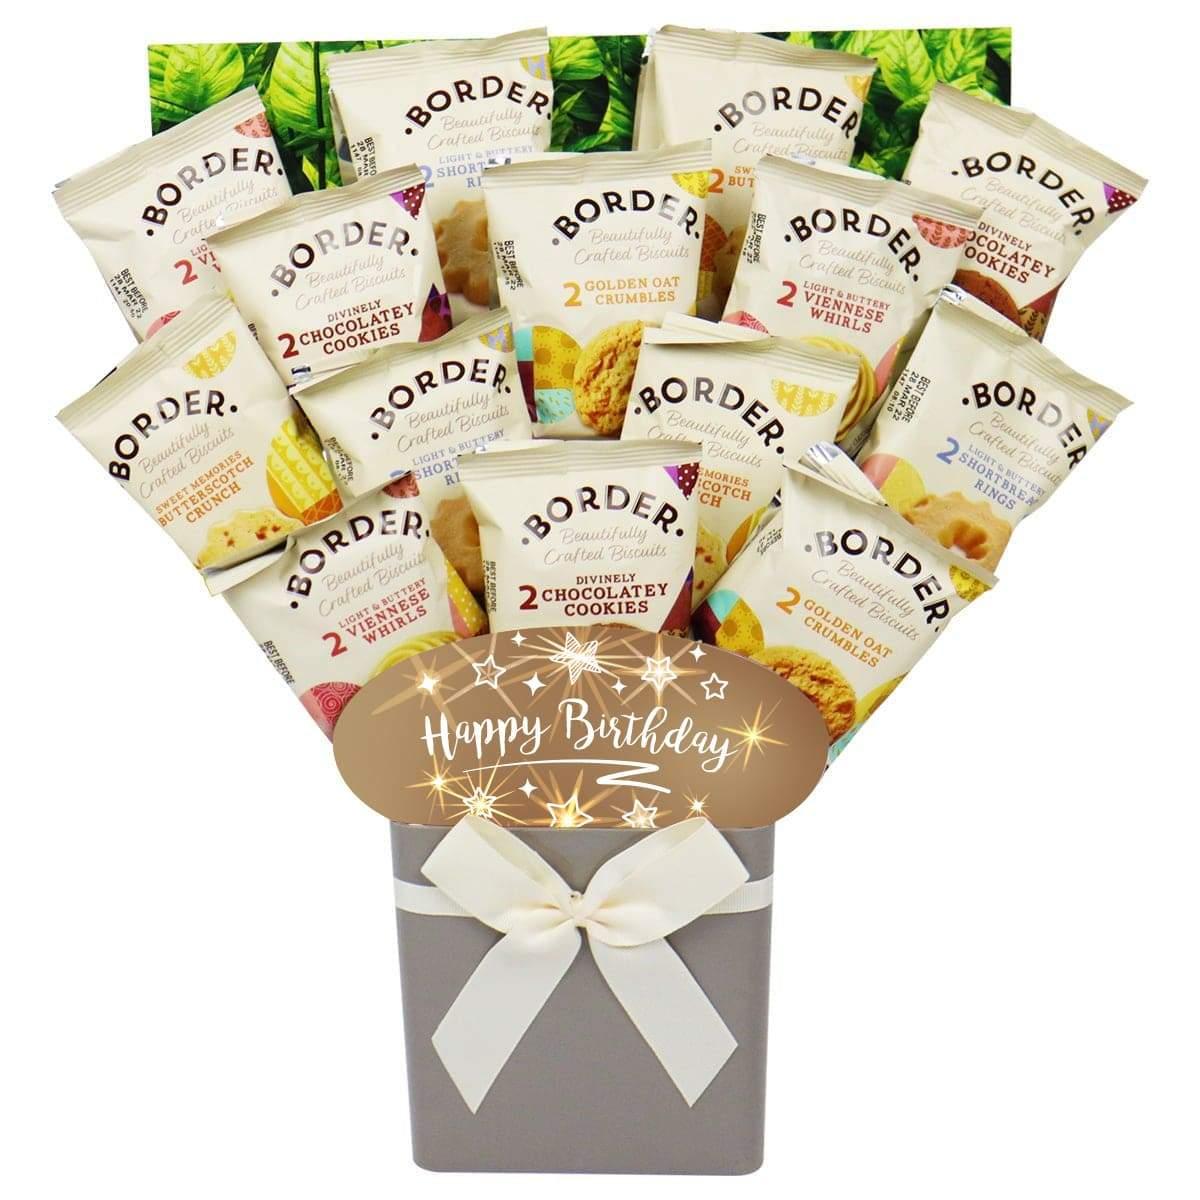 The Happy Birthday Border Biscuit Bouquet